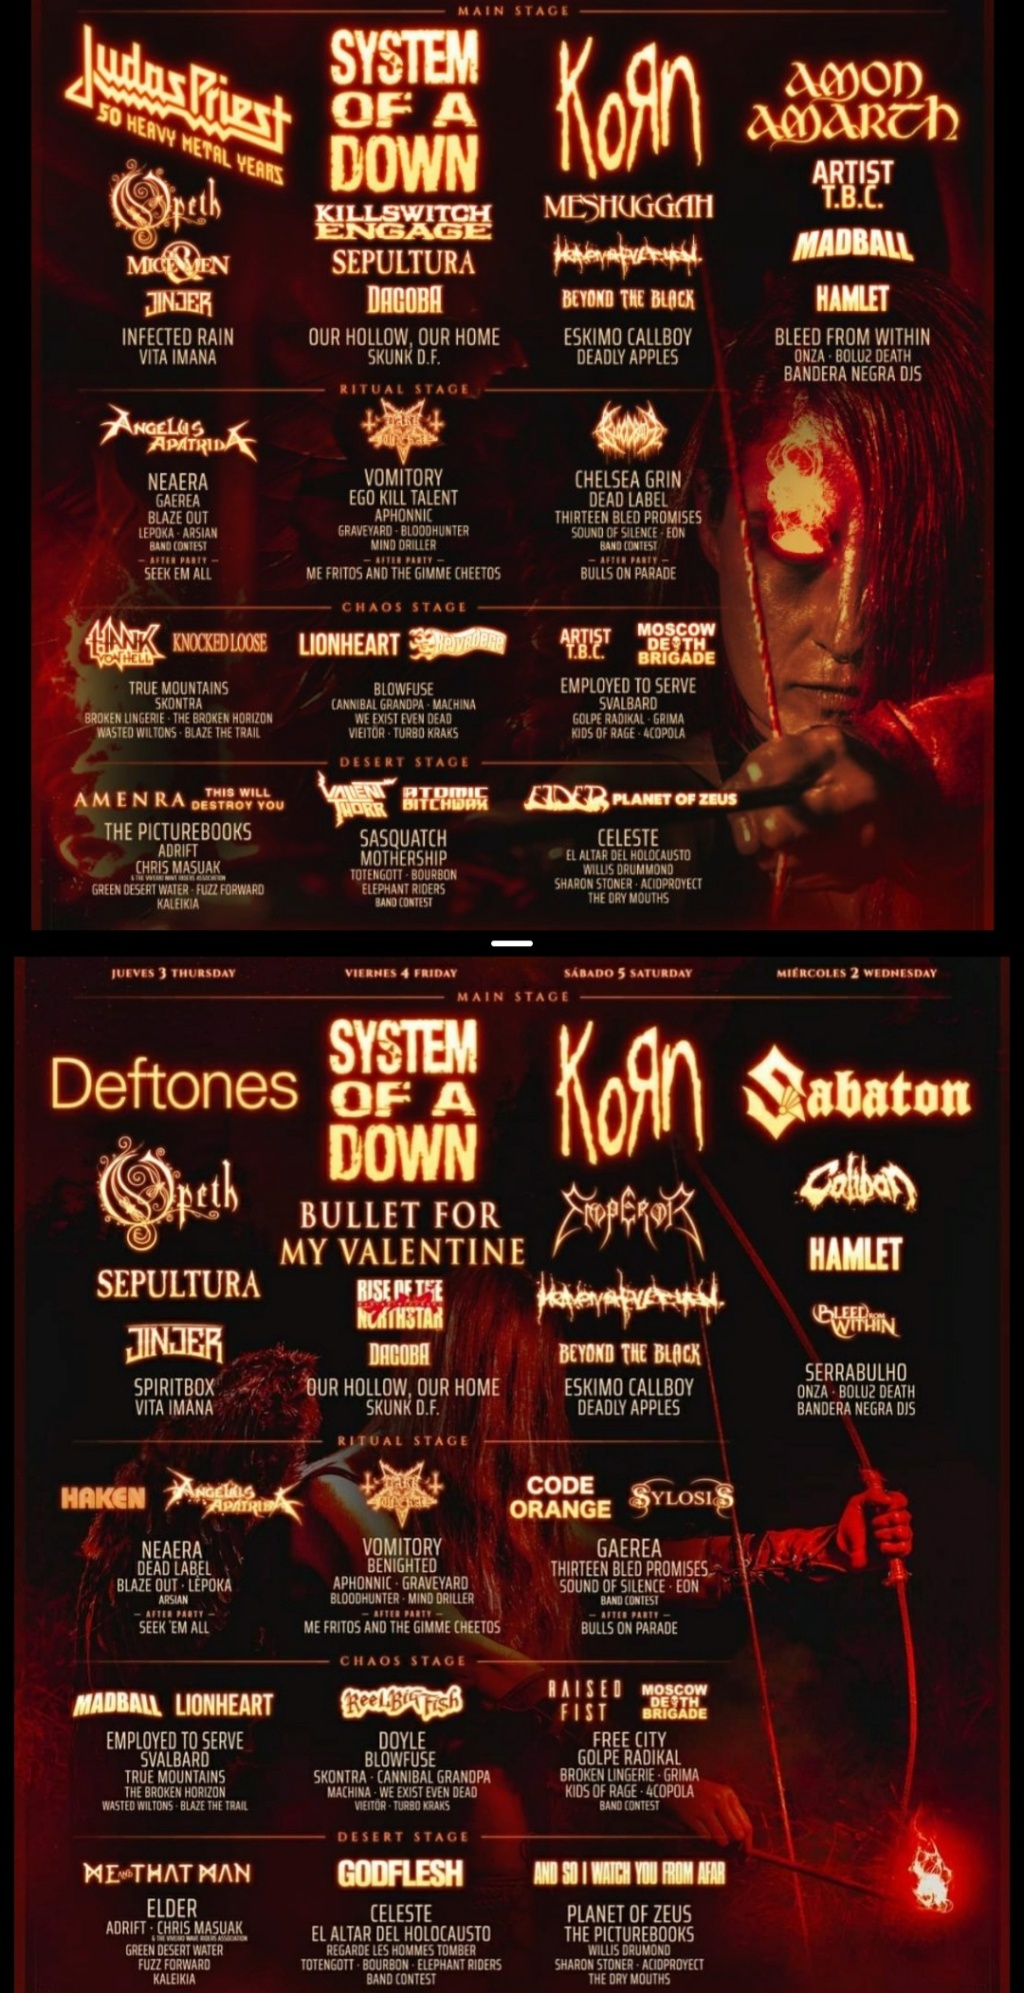 Resurrection Fest Estrella Galicia 2021. (2 - 5 Junio) System of a Down, Deftones, KoRn - Página 2 Img_2018